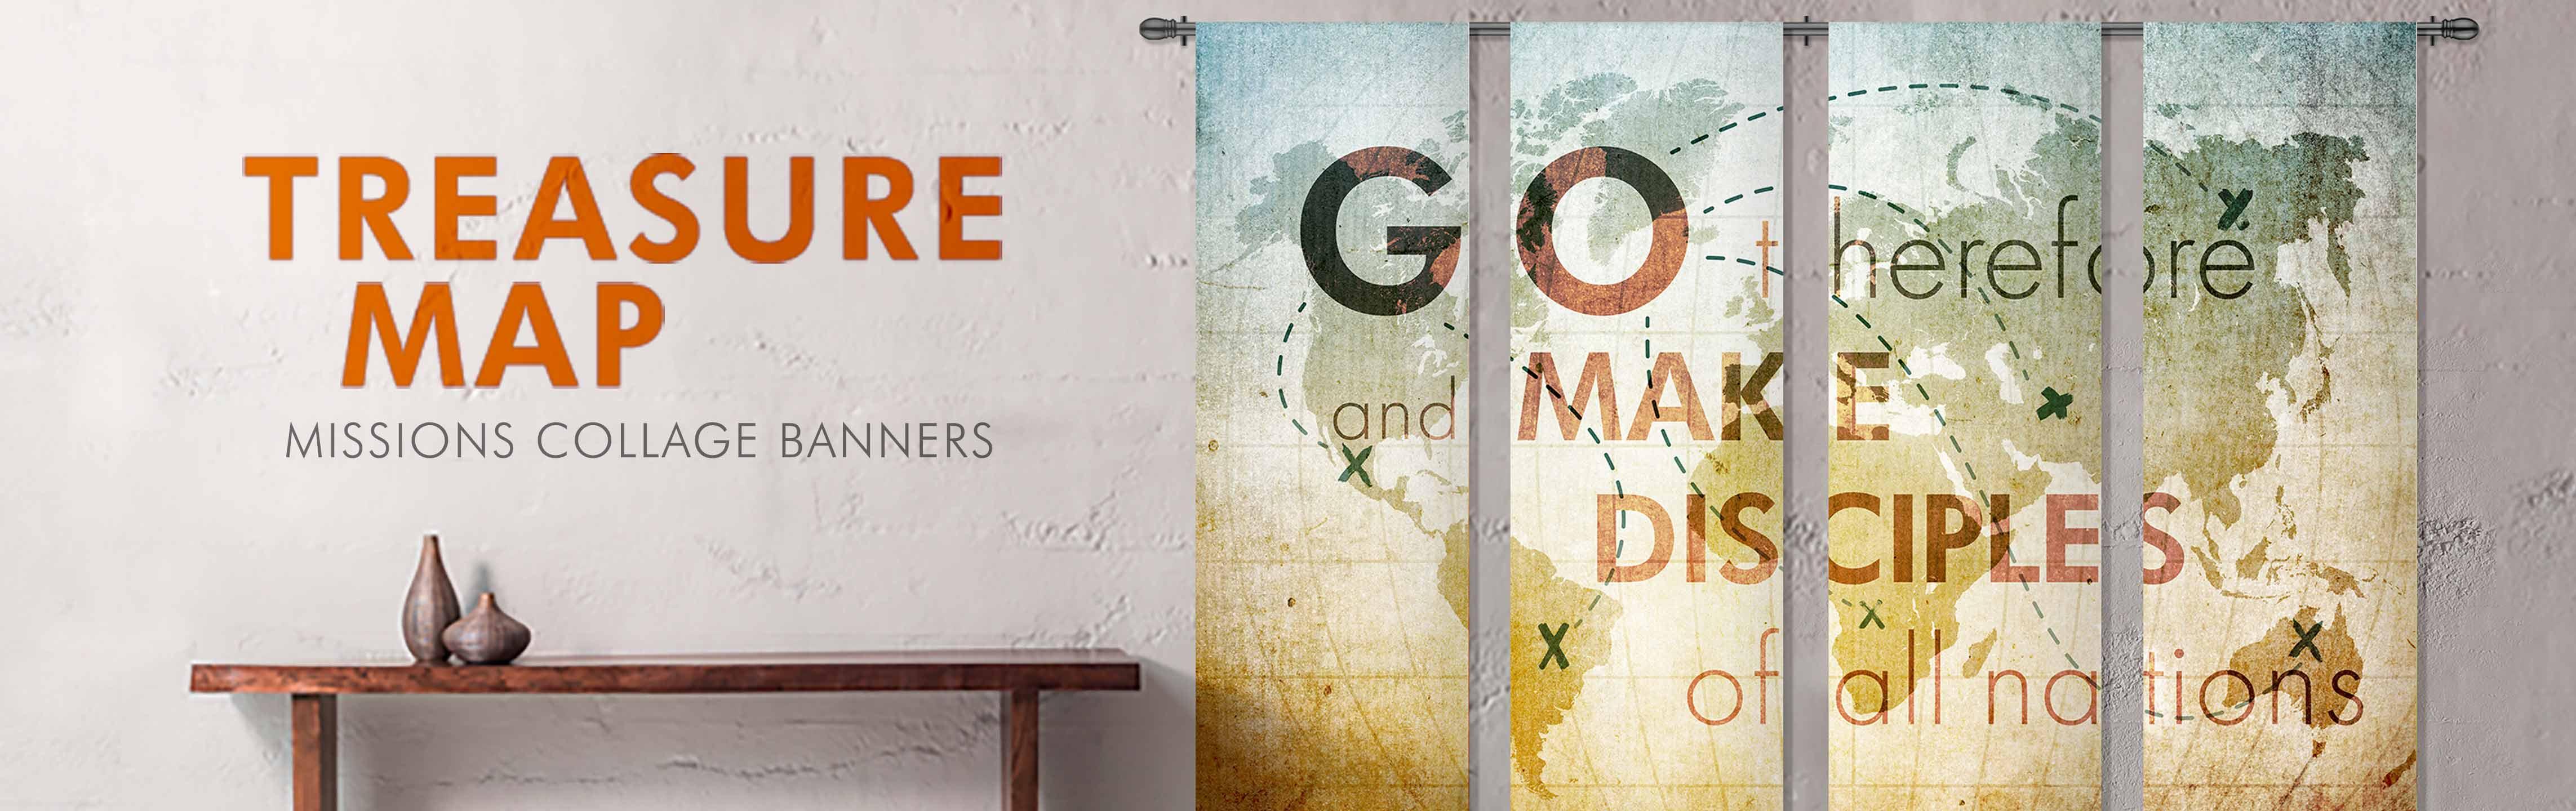 fabric church banners